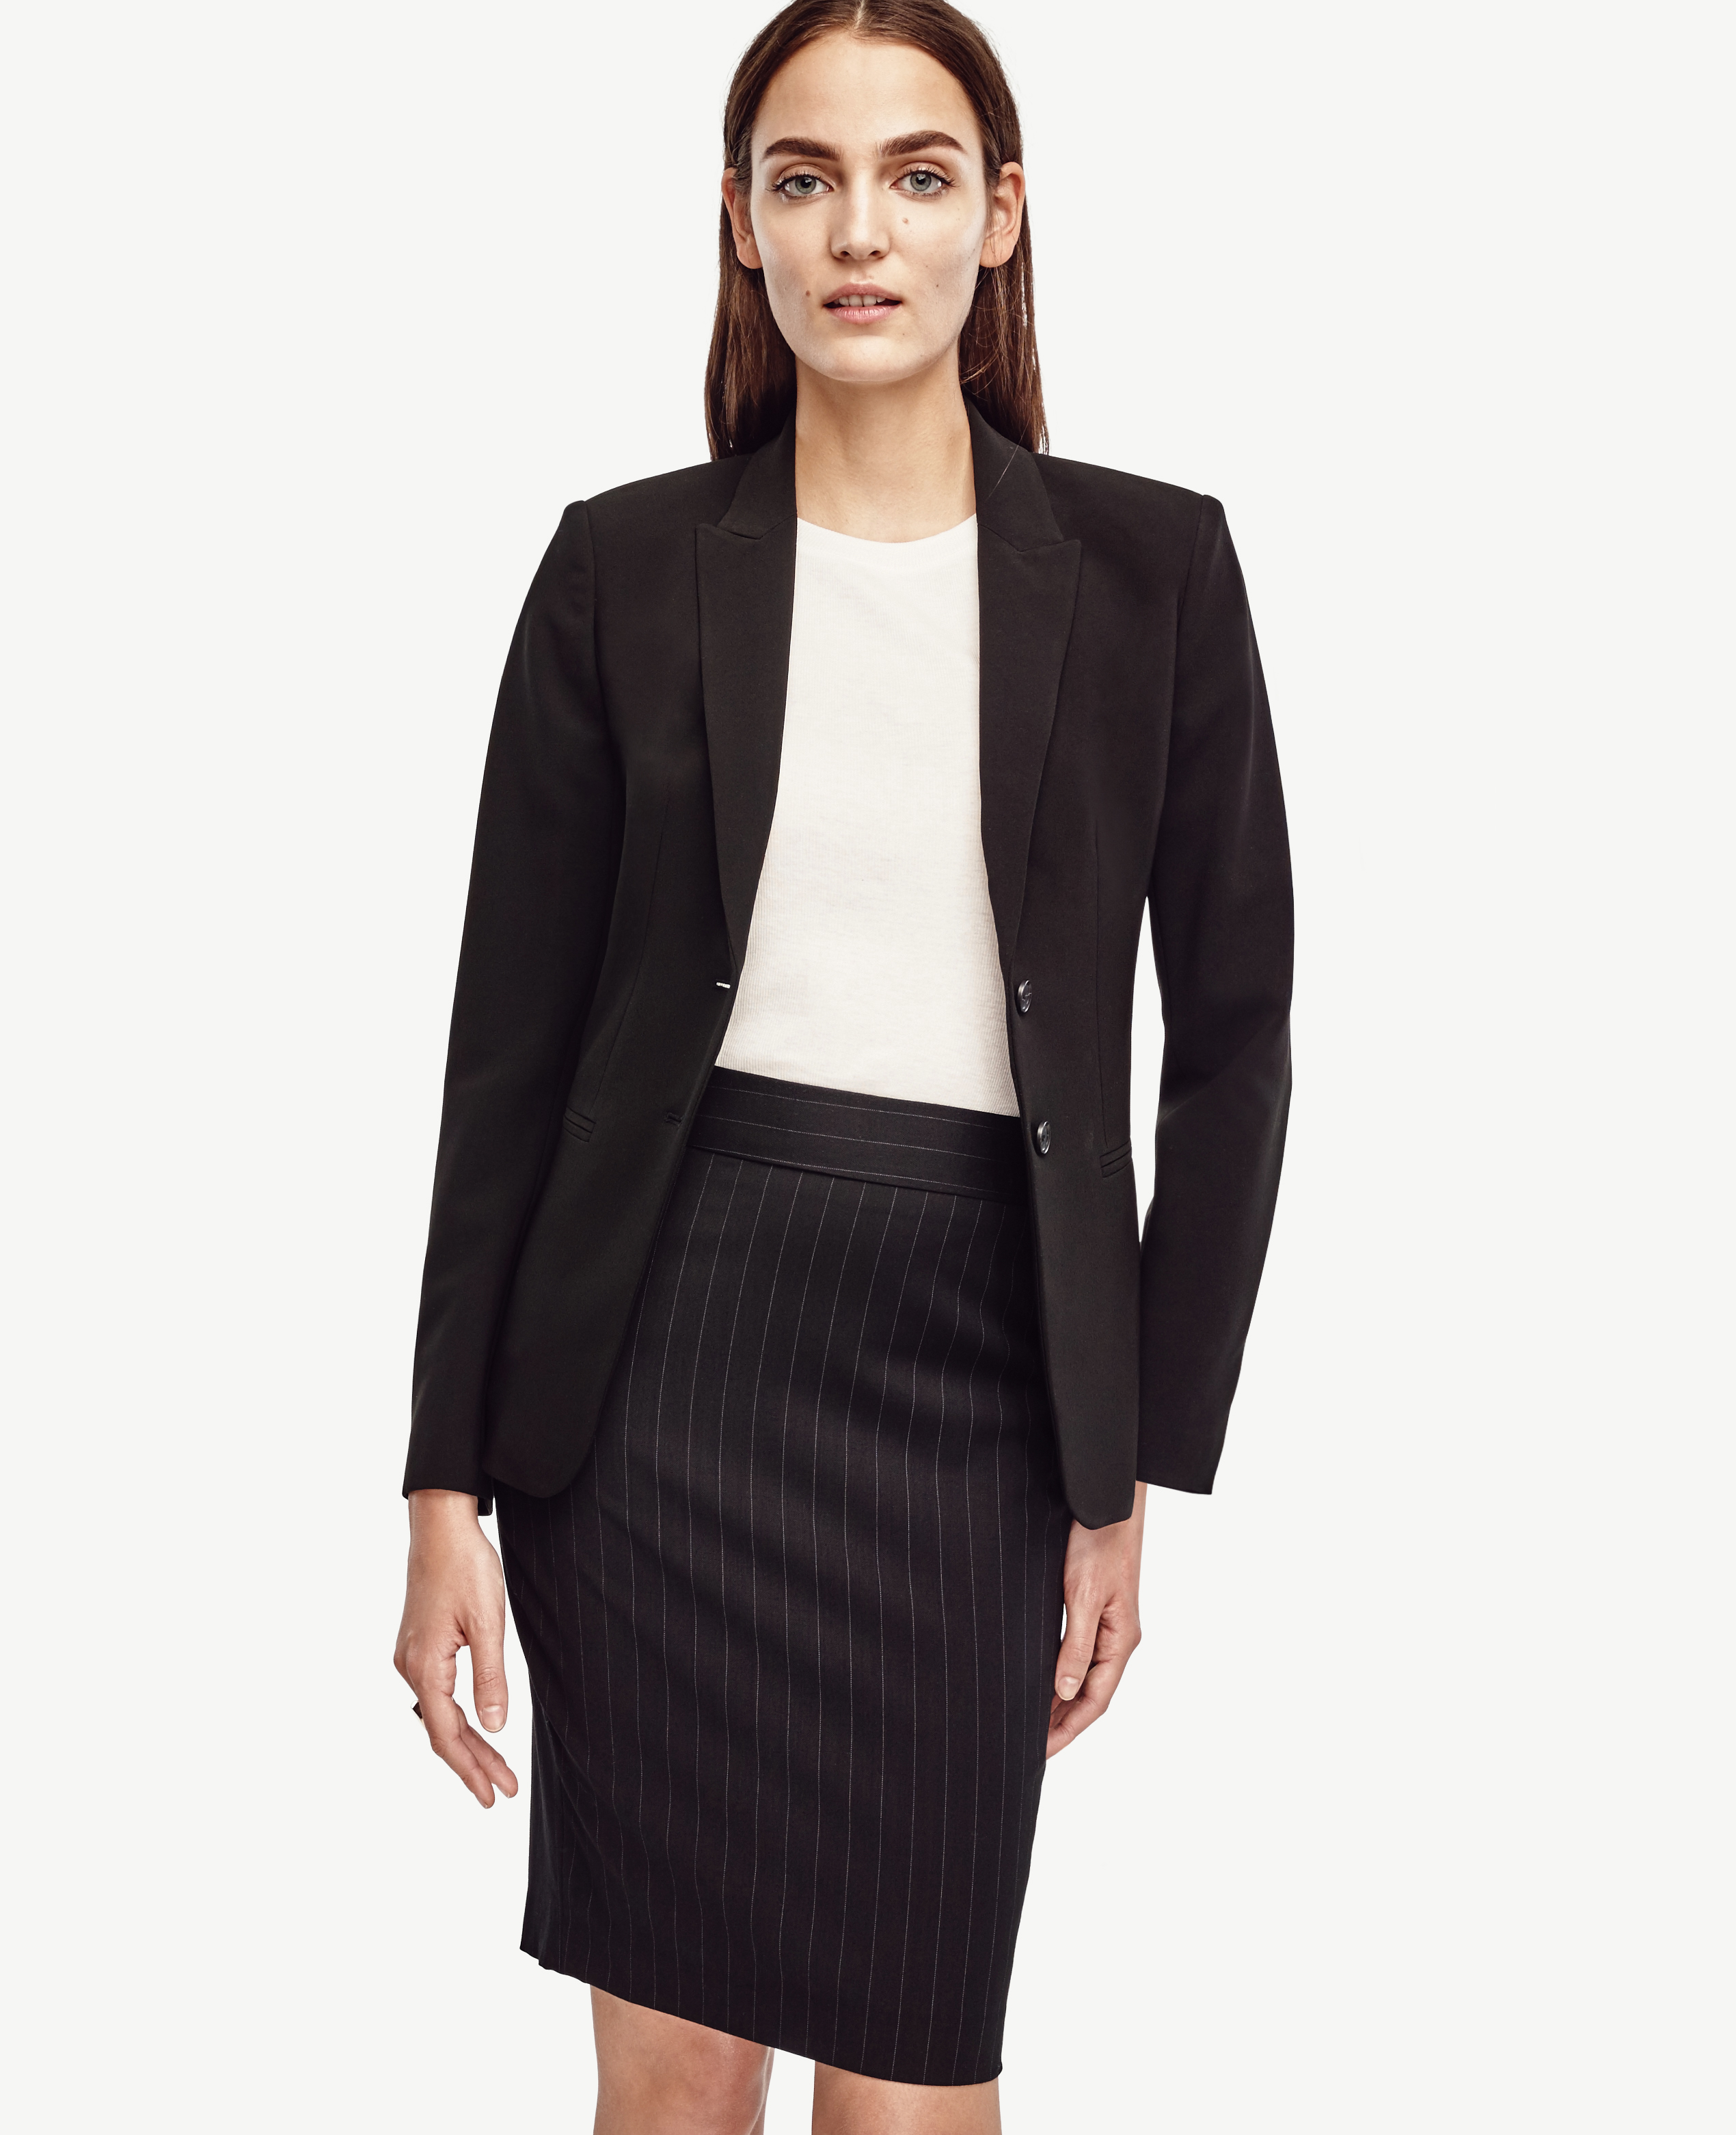 Ann taylor Wool Pinstripe Pencil Skirt in Black | Lyst